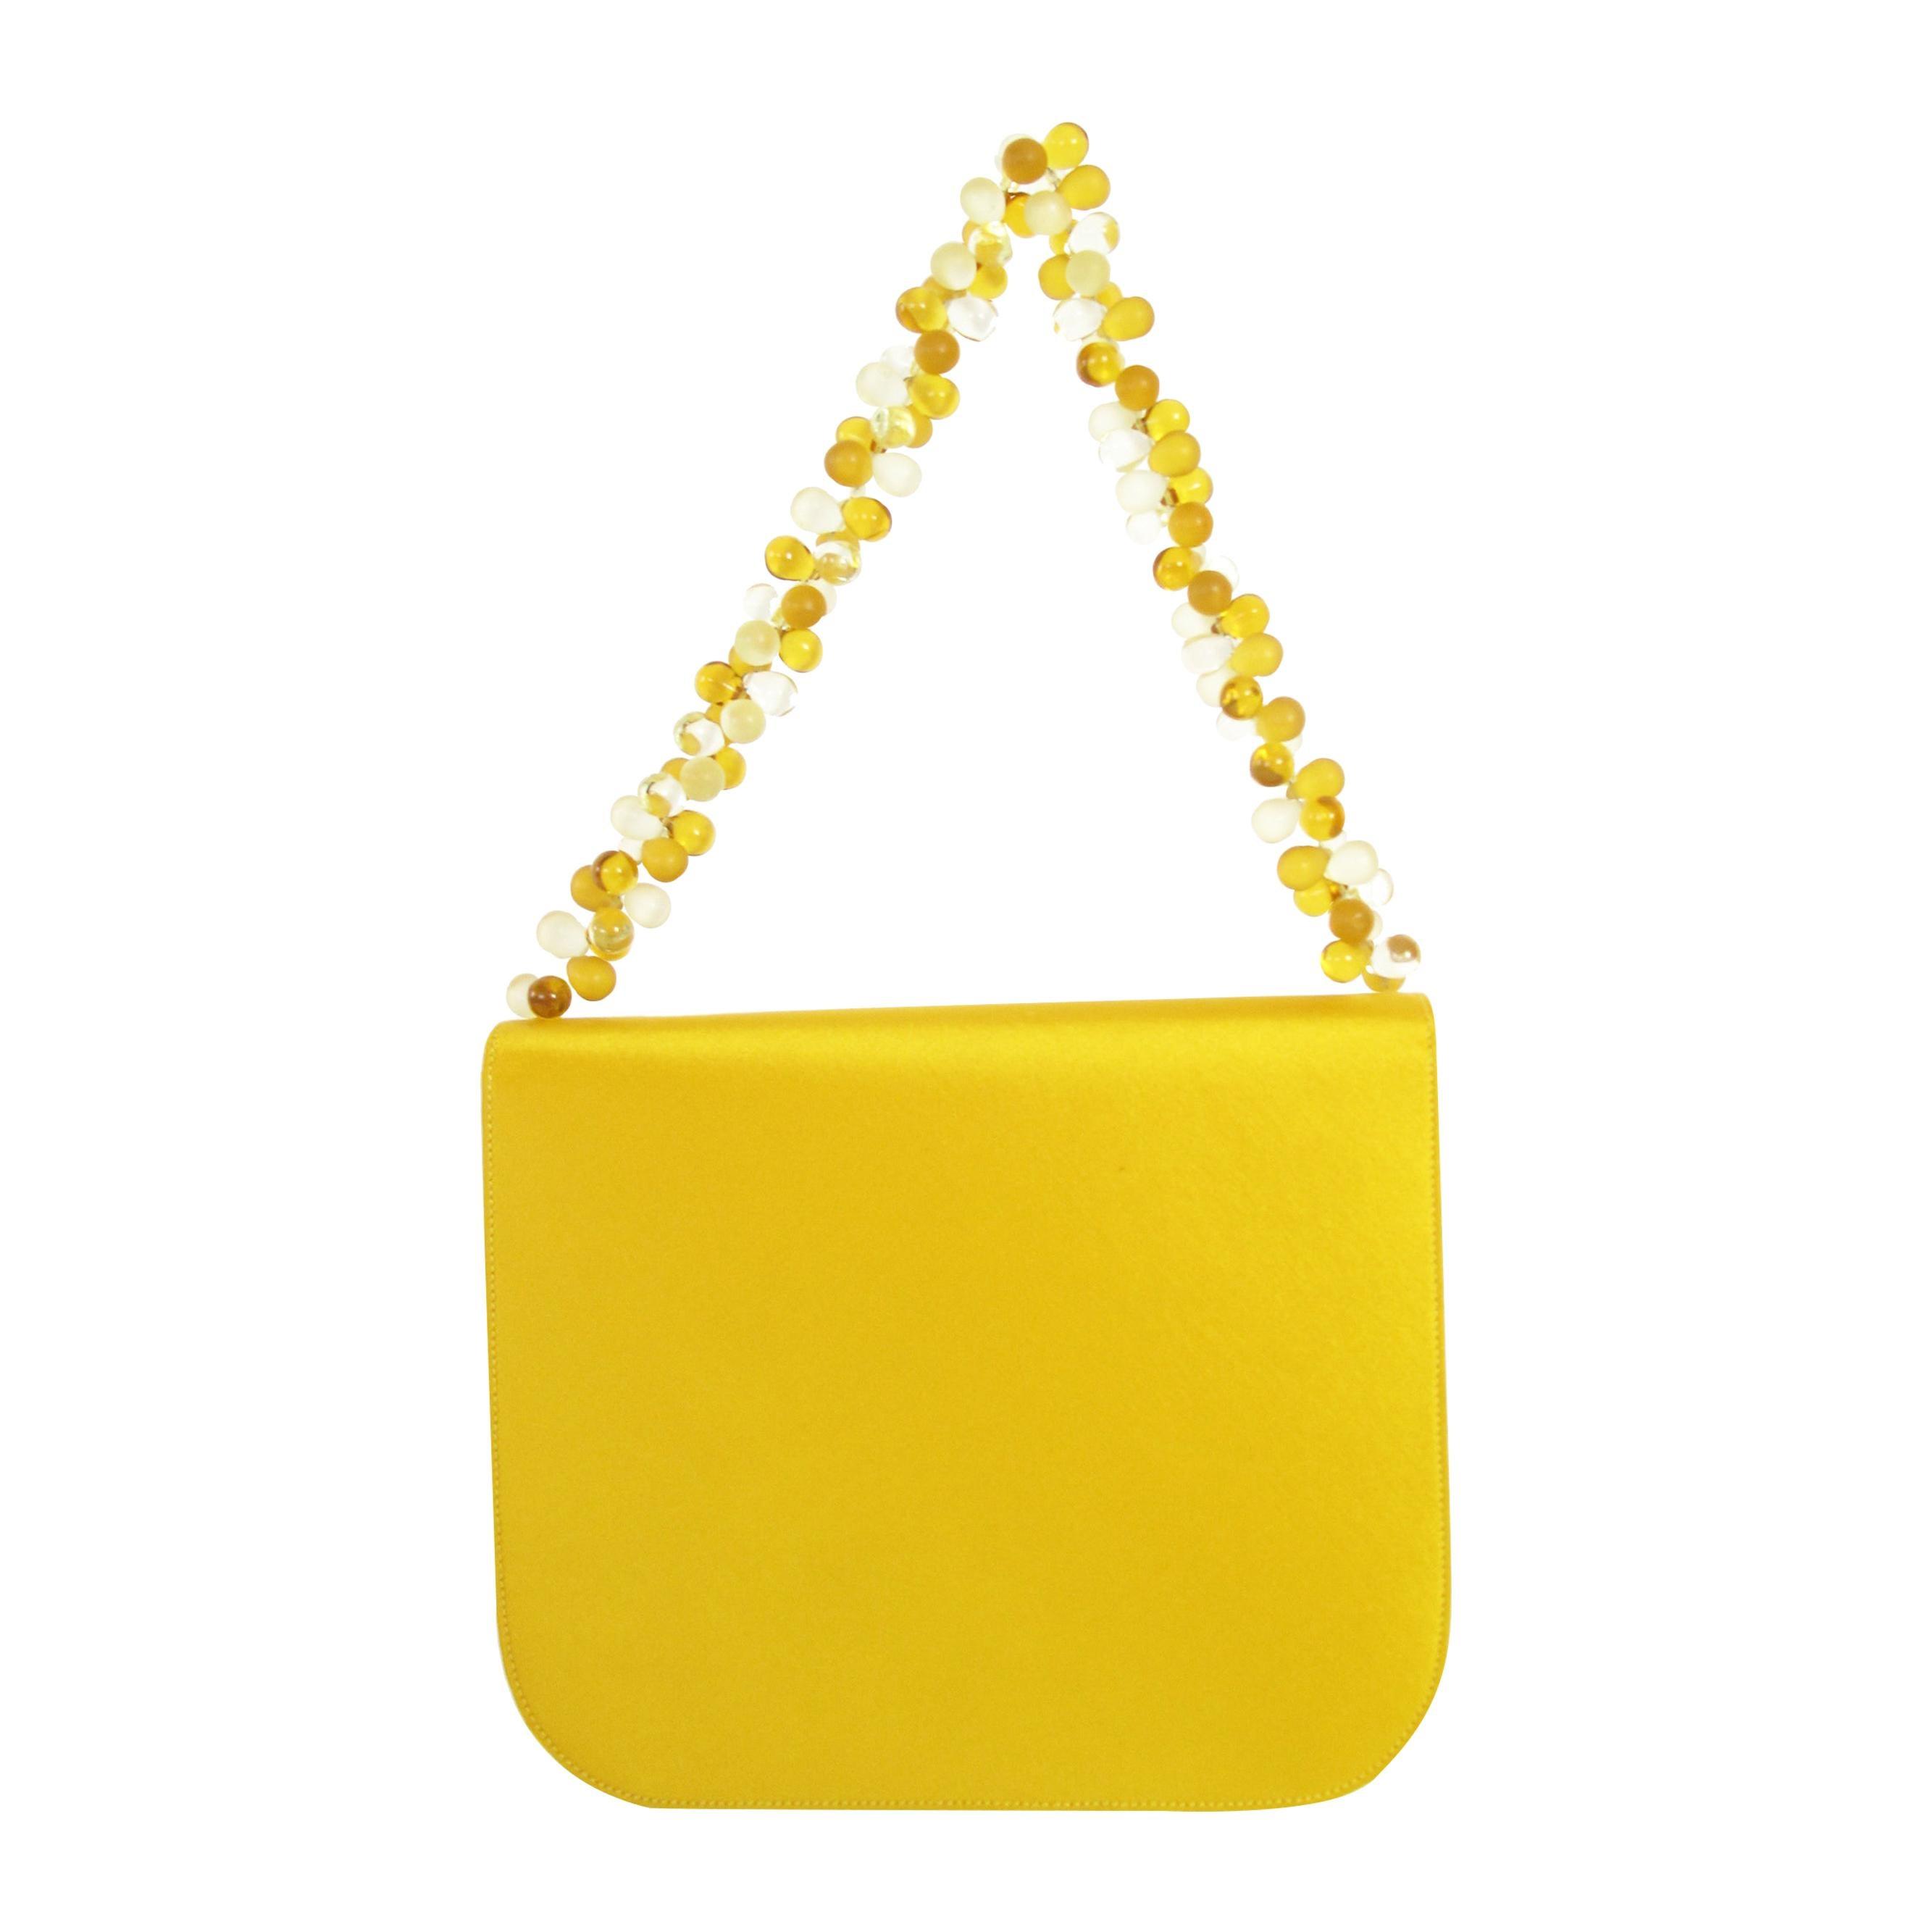 Renaud Pellegrino Yellow Satin Flap Bag with Beaded Handle